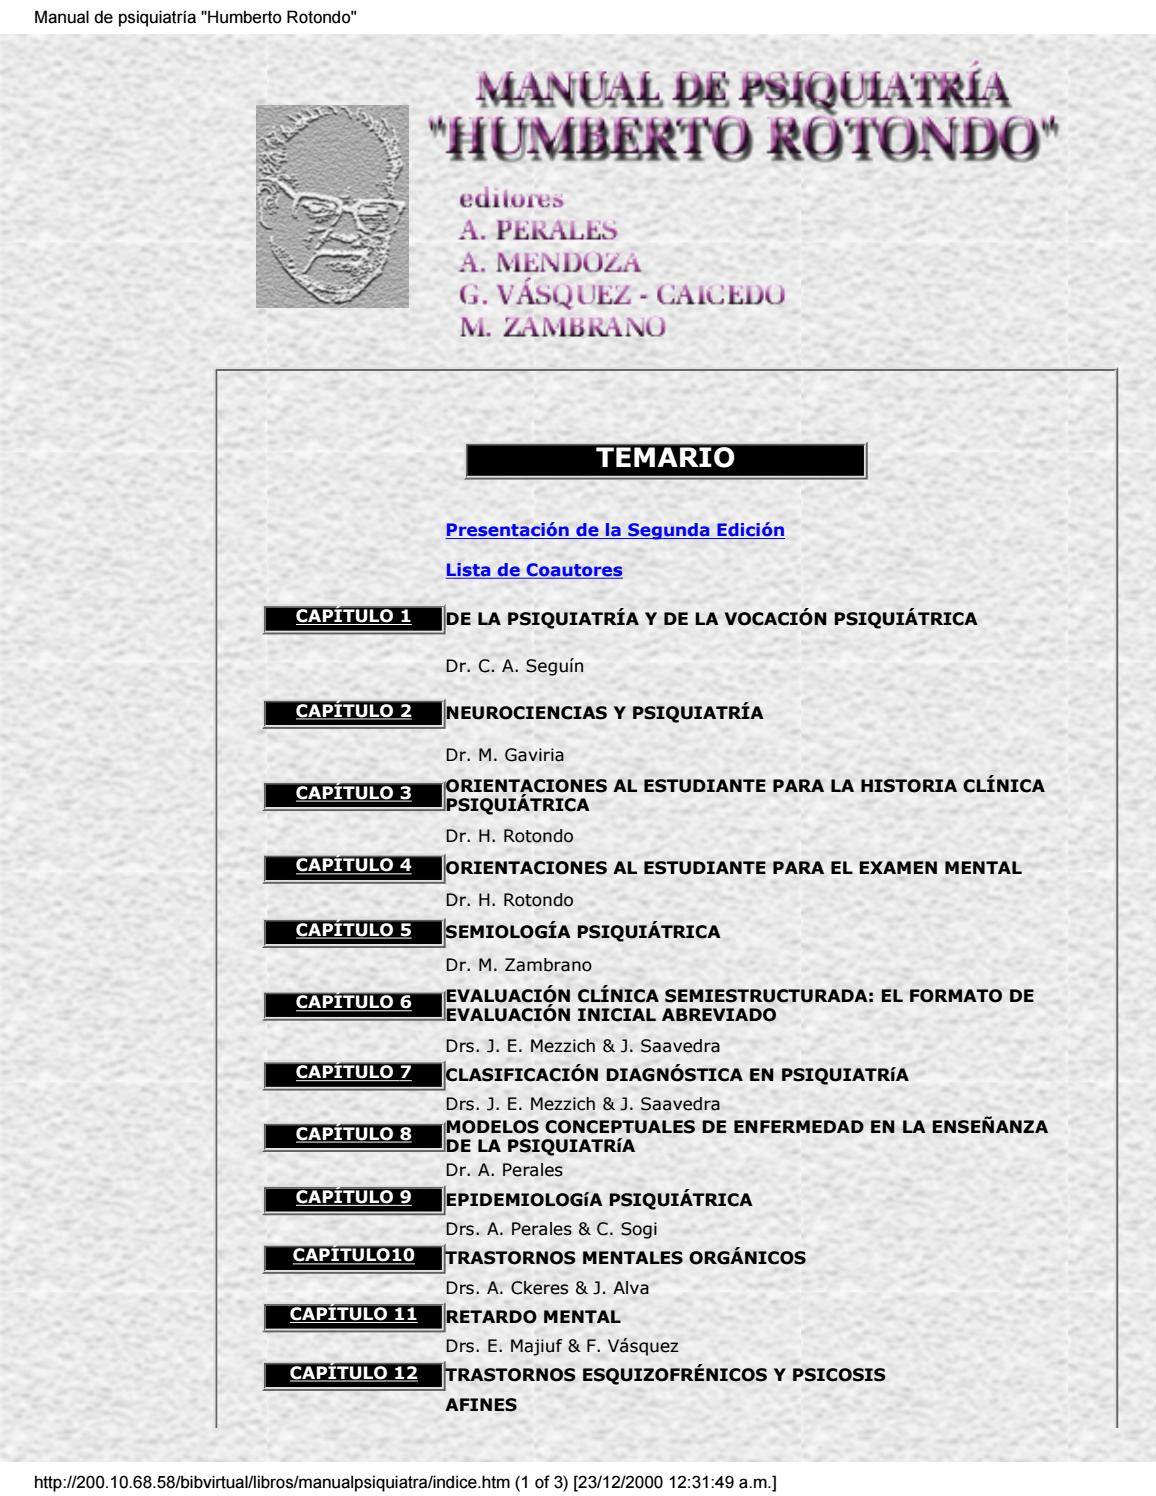 Manual de psiquiatria by Iris Sanchez - issuu